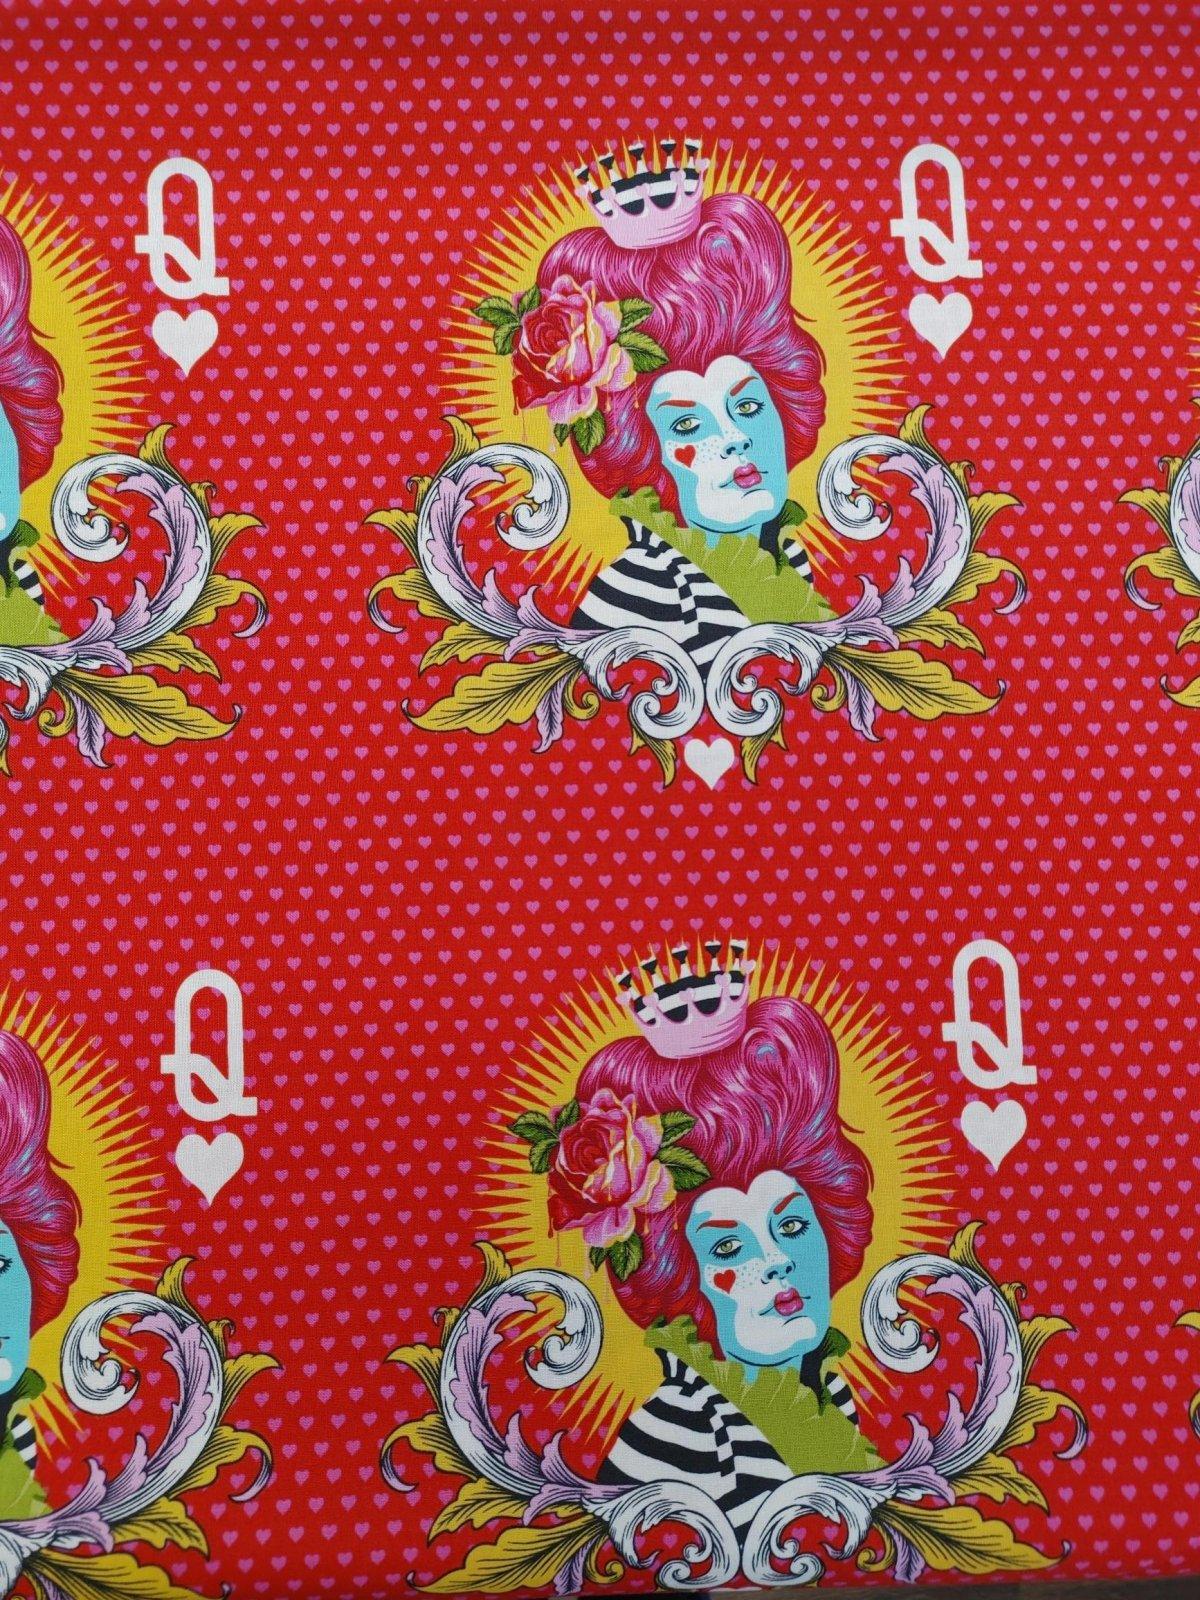 The Red Queen - Wonder